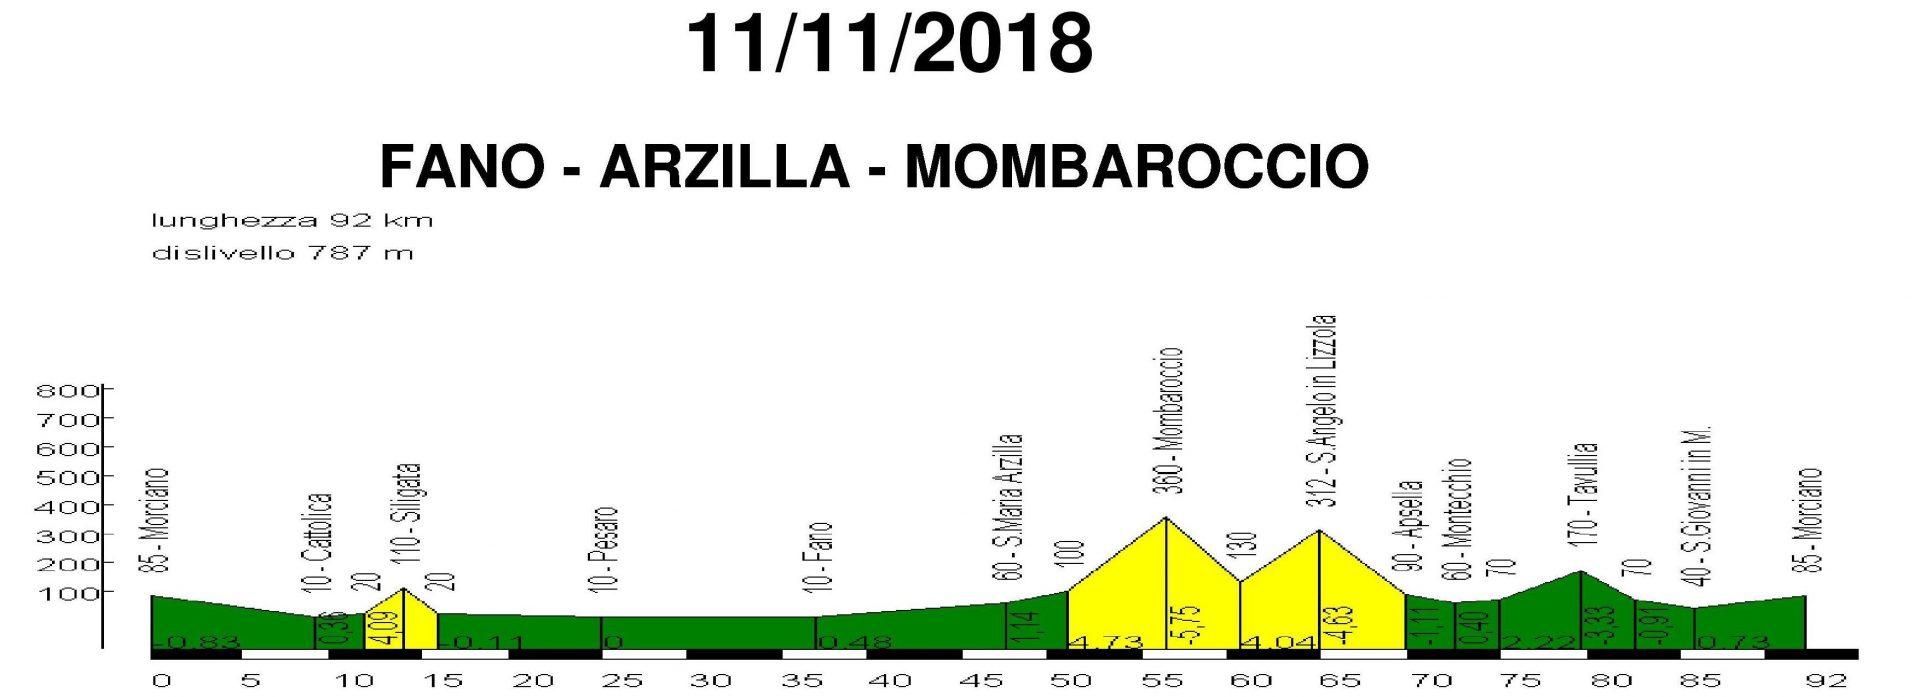 Domenica 11-nov-2018 Fano Arzilla Monbaroccio